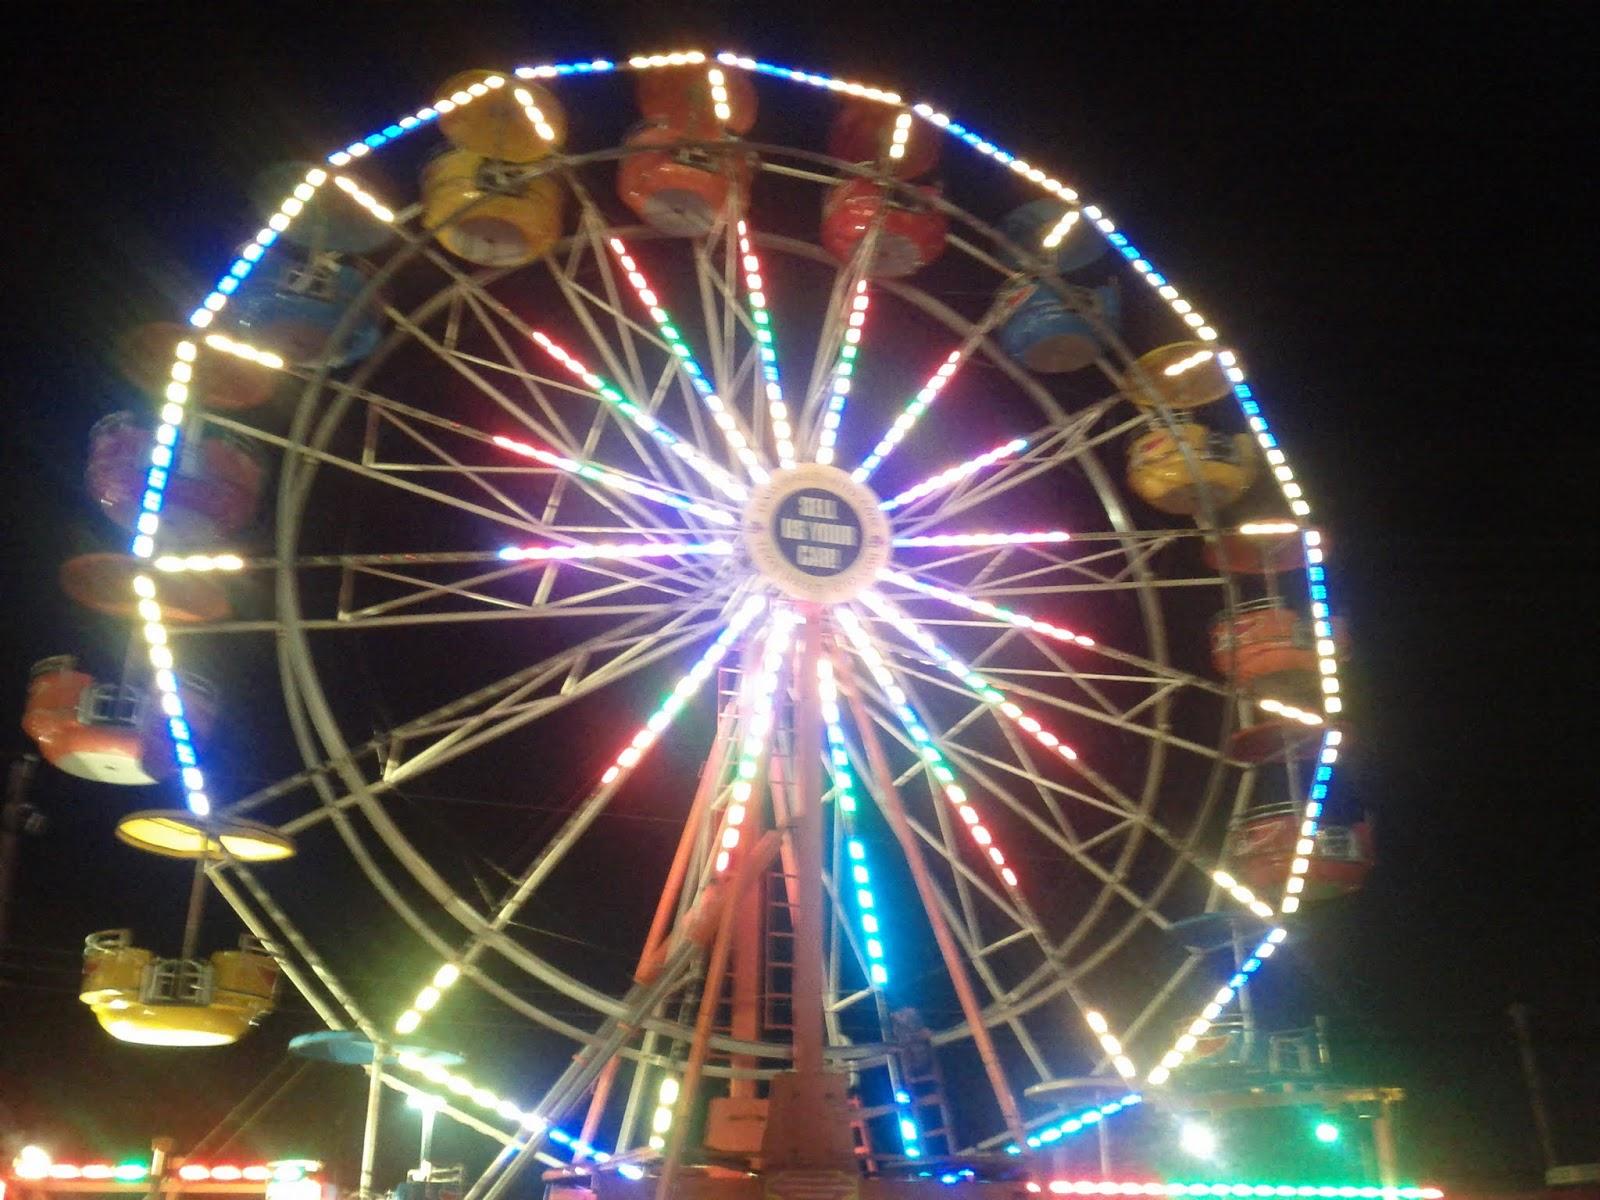 Fort Bend County Fair 2012 - IMG_20121006_201655.jpg